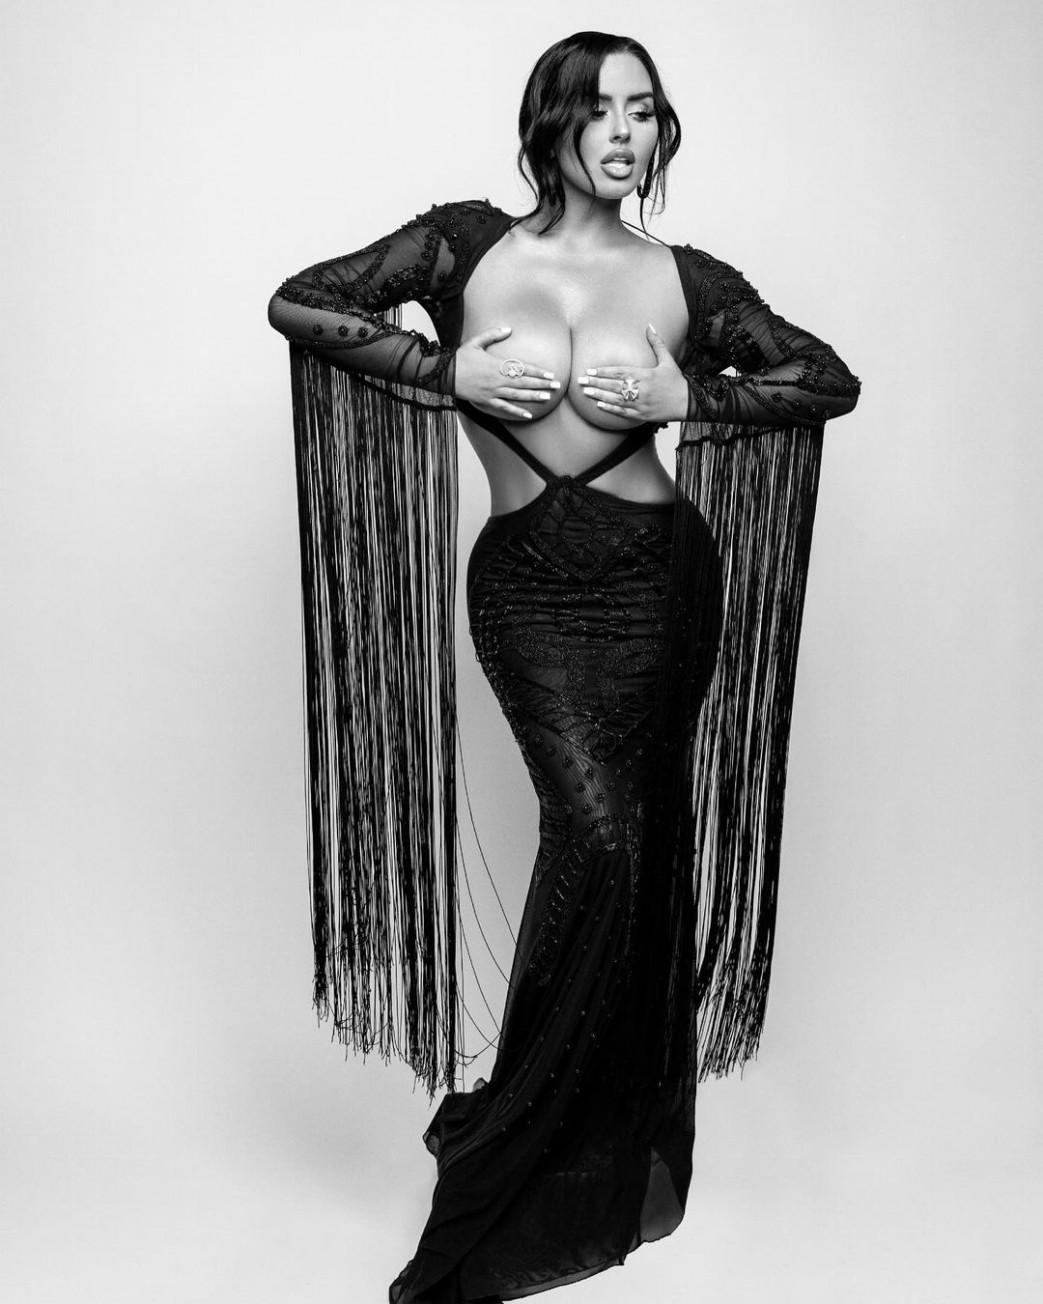 Abigail-Ratchford-Hand-Bra-In-Black-Dress-2.jpg